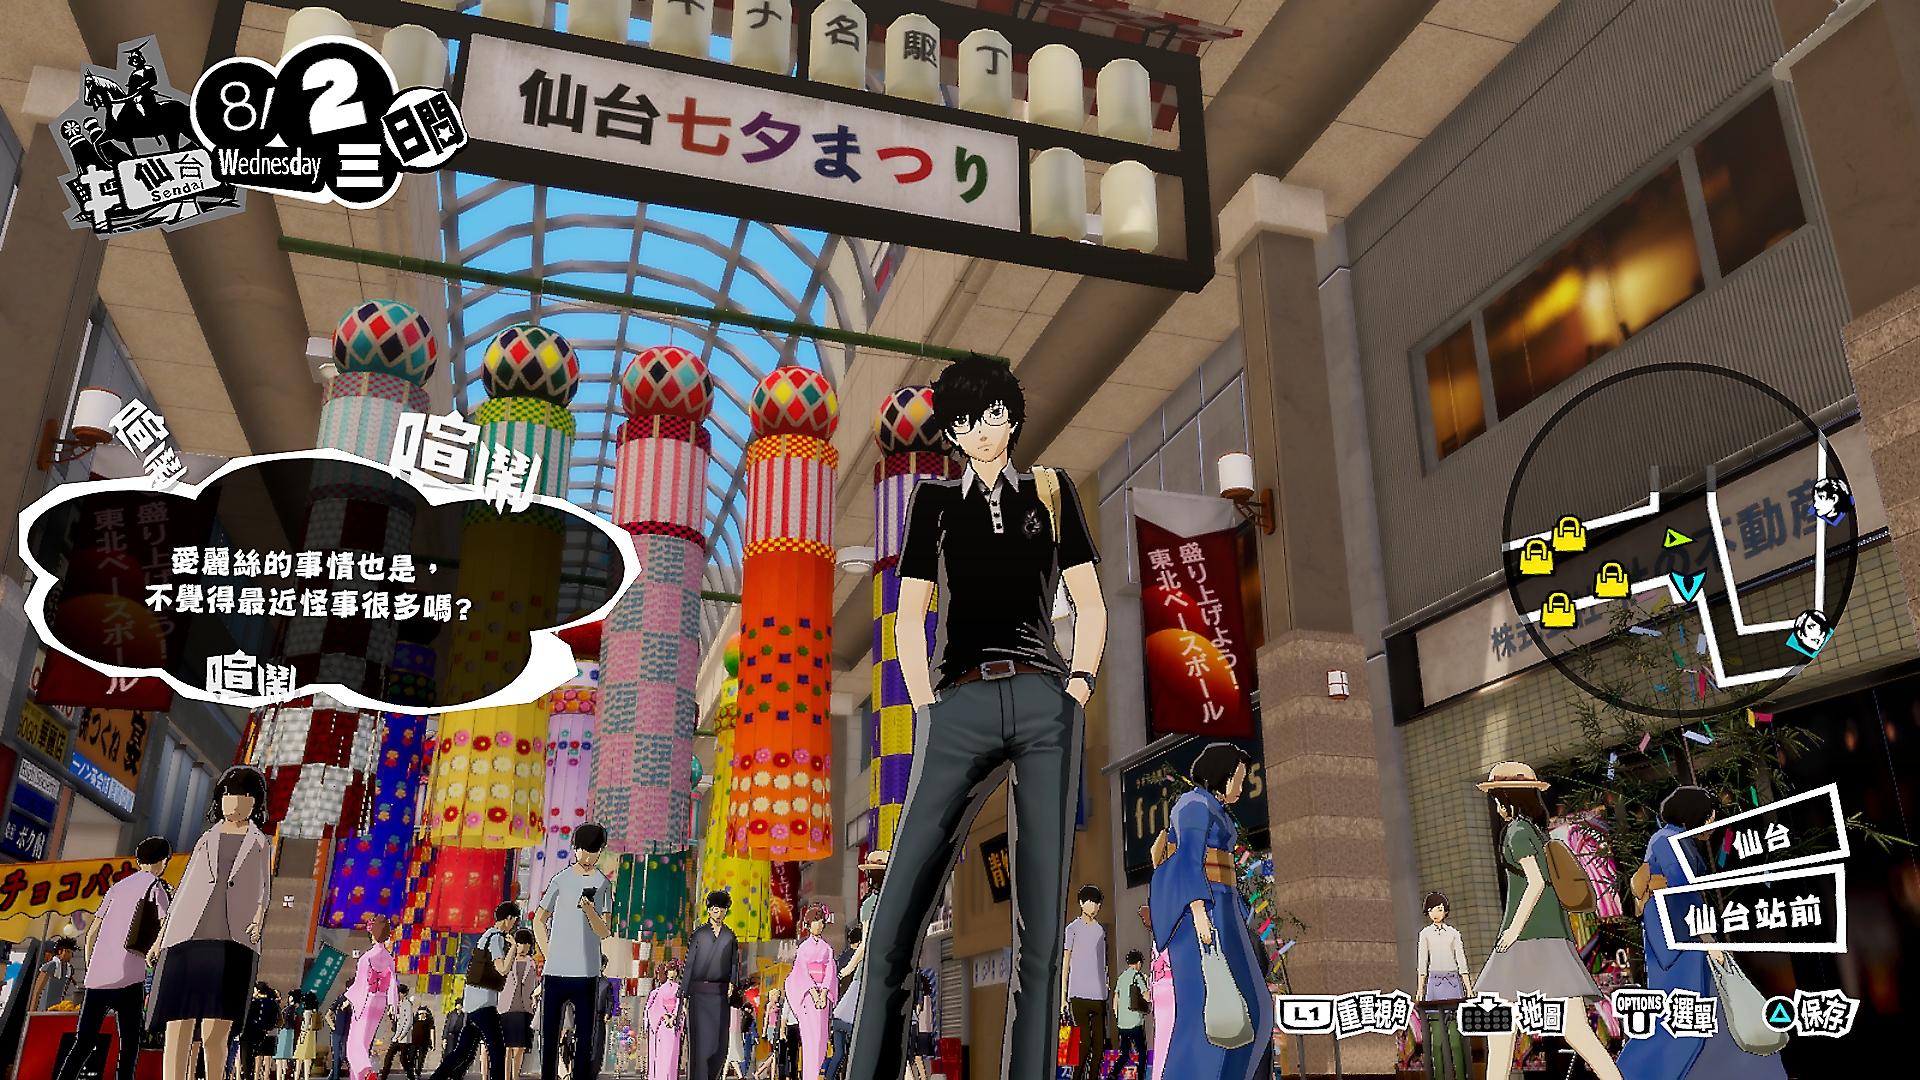 Persona 5 STRIKERS - Gallery Screenshot 9